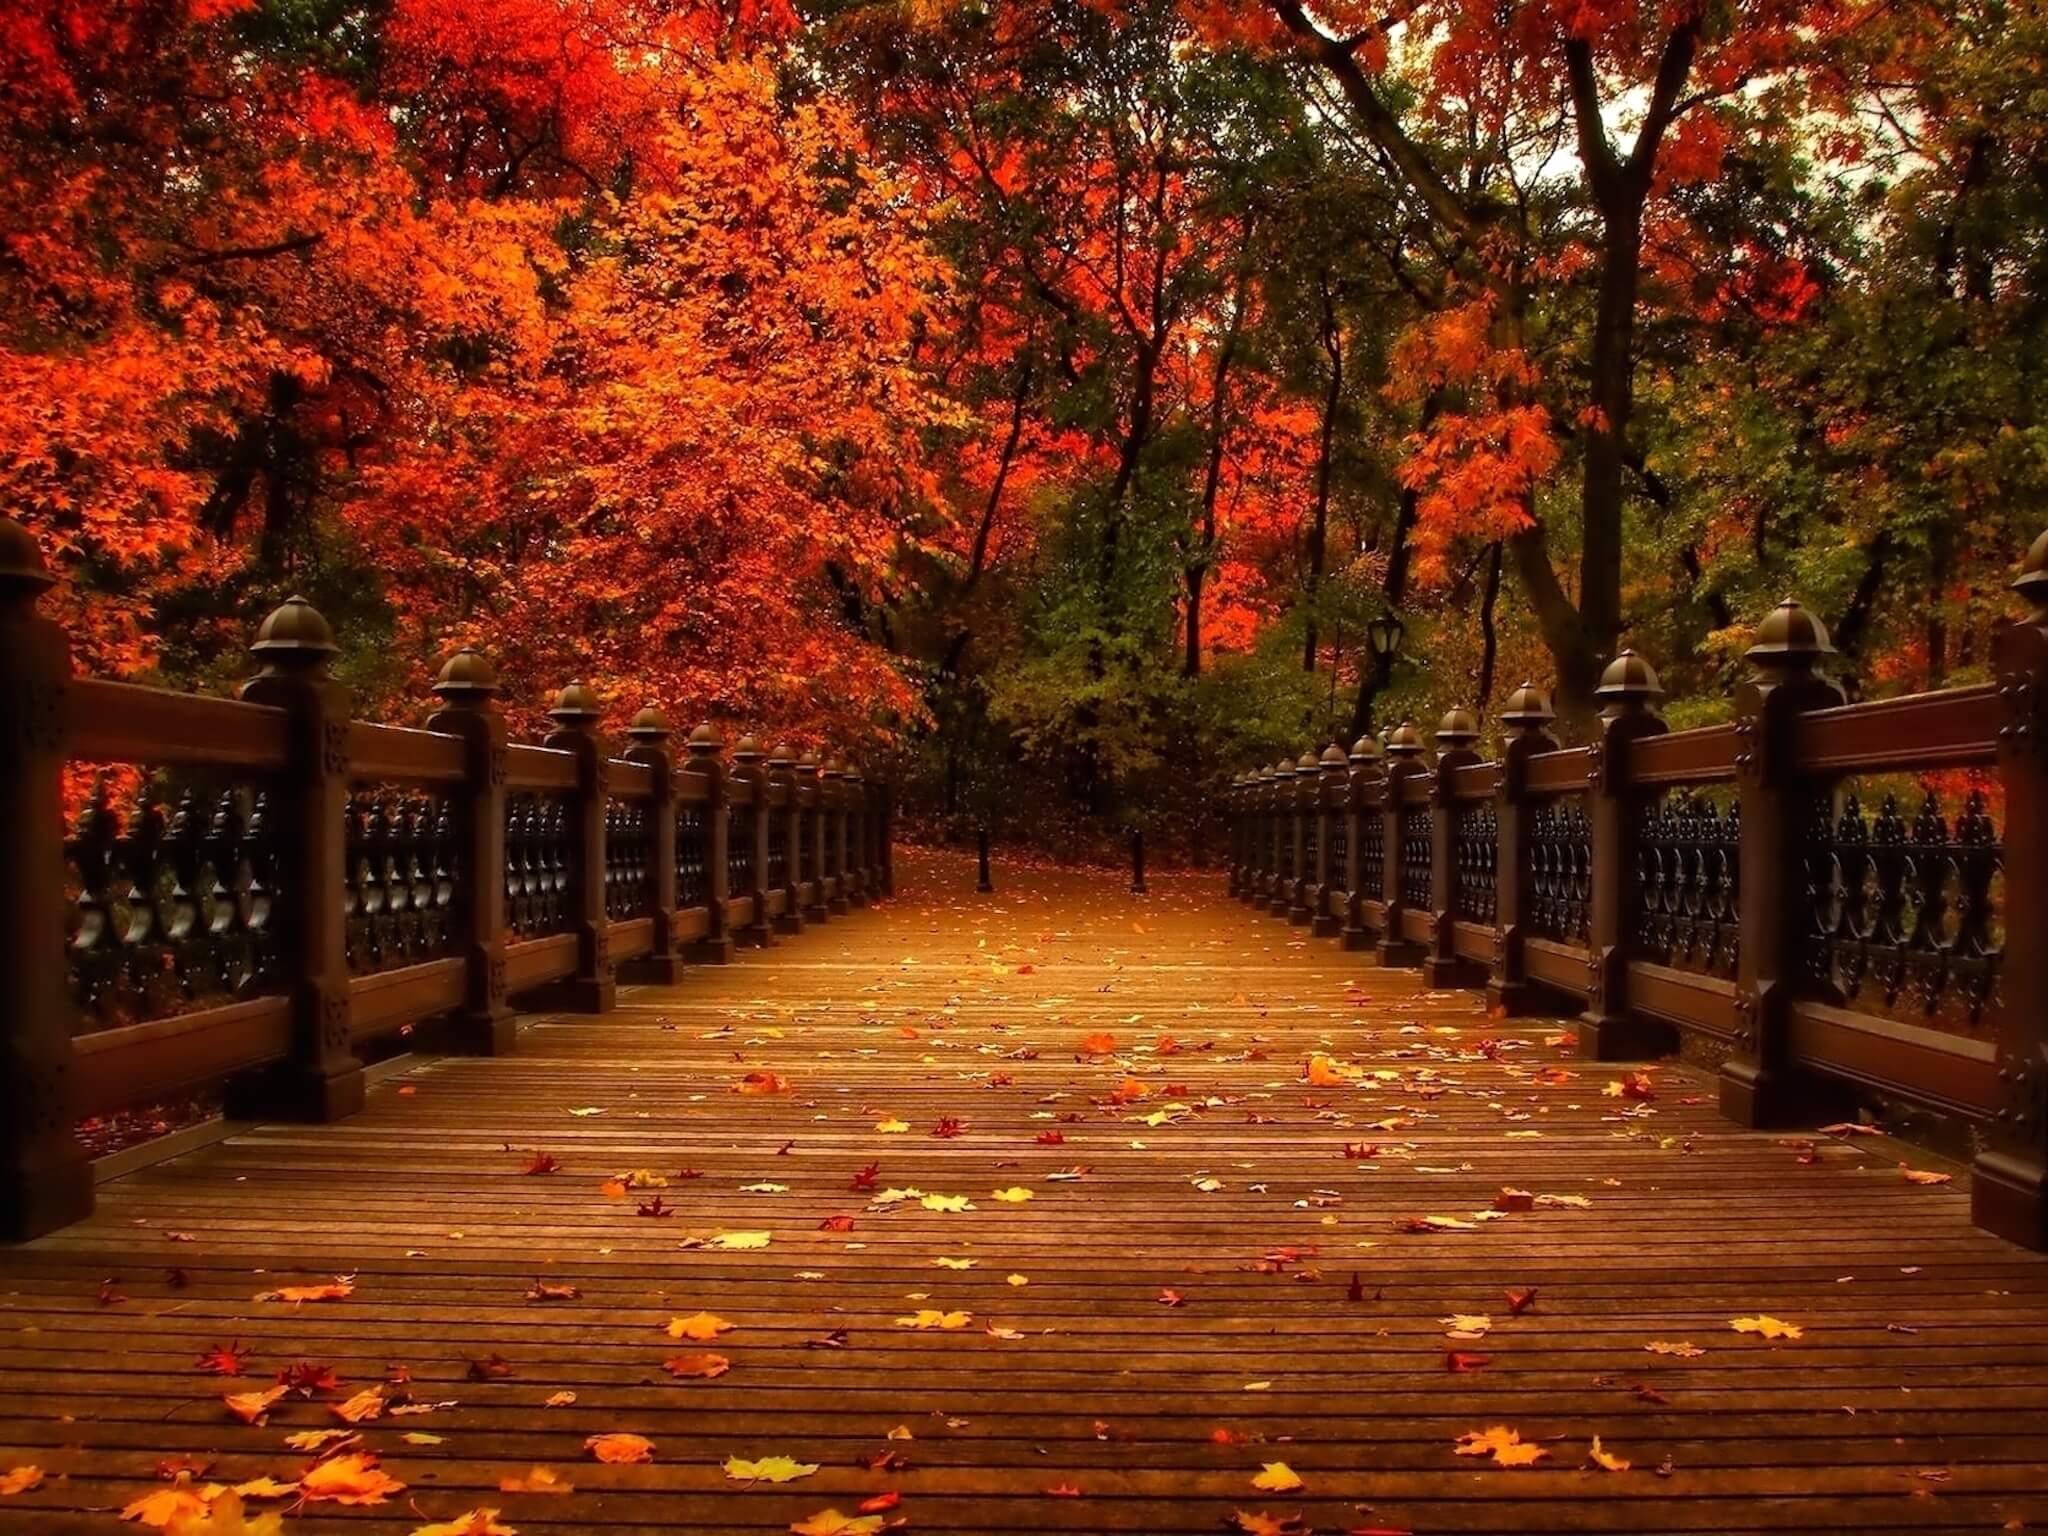 Autumn Park Bridge Wallpaper